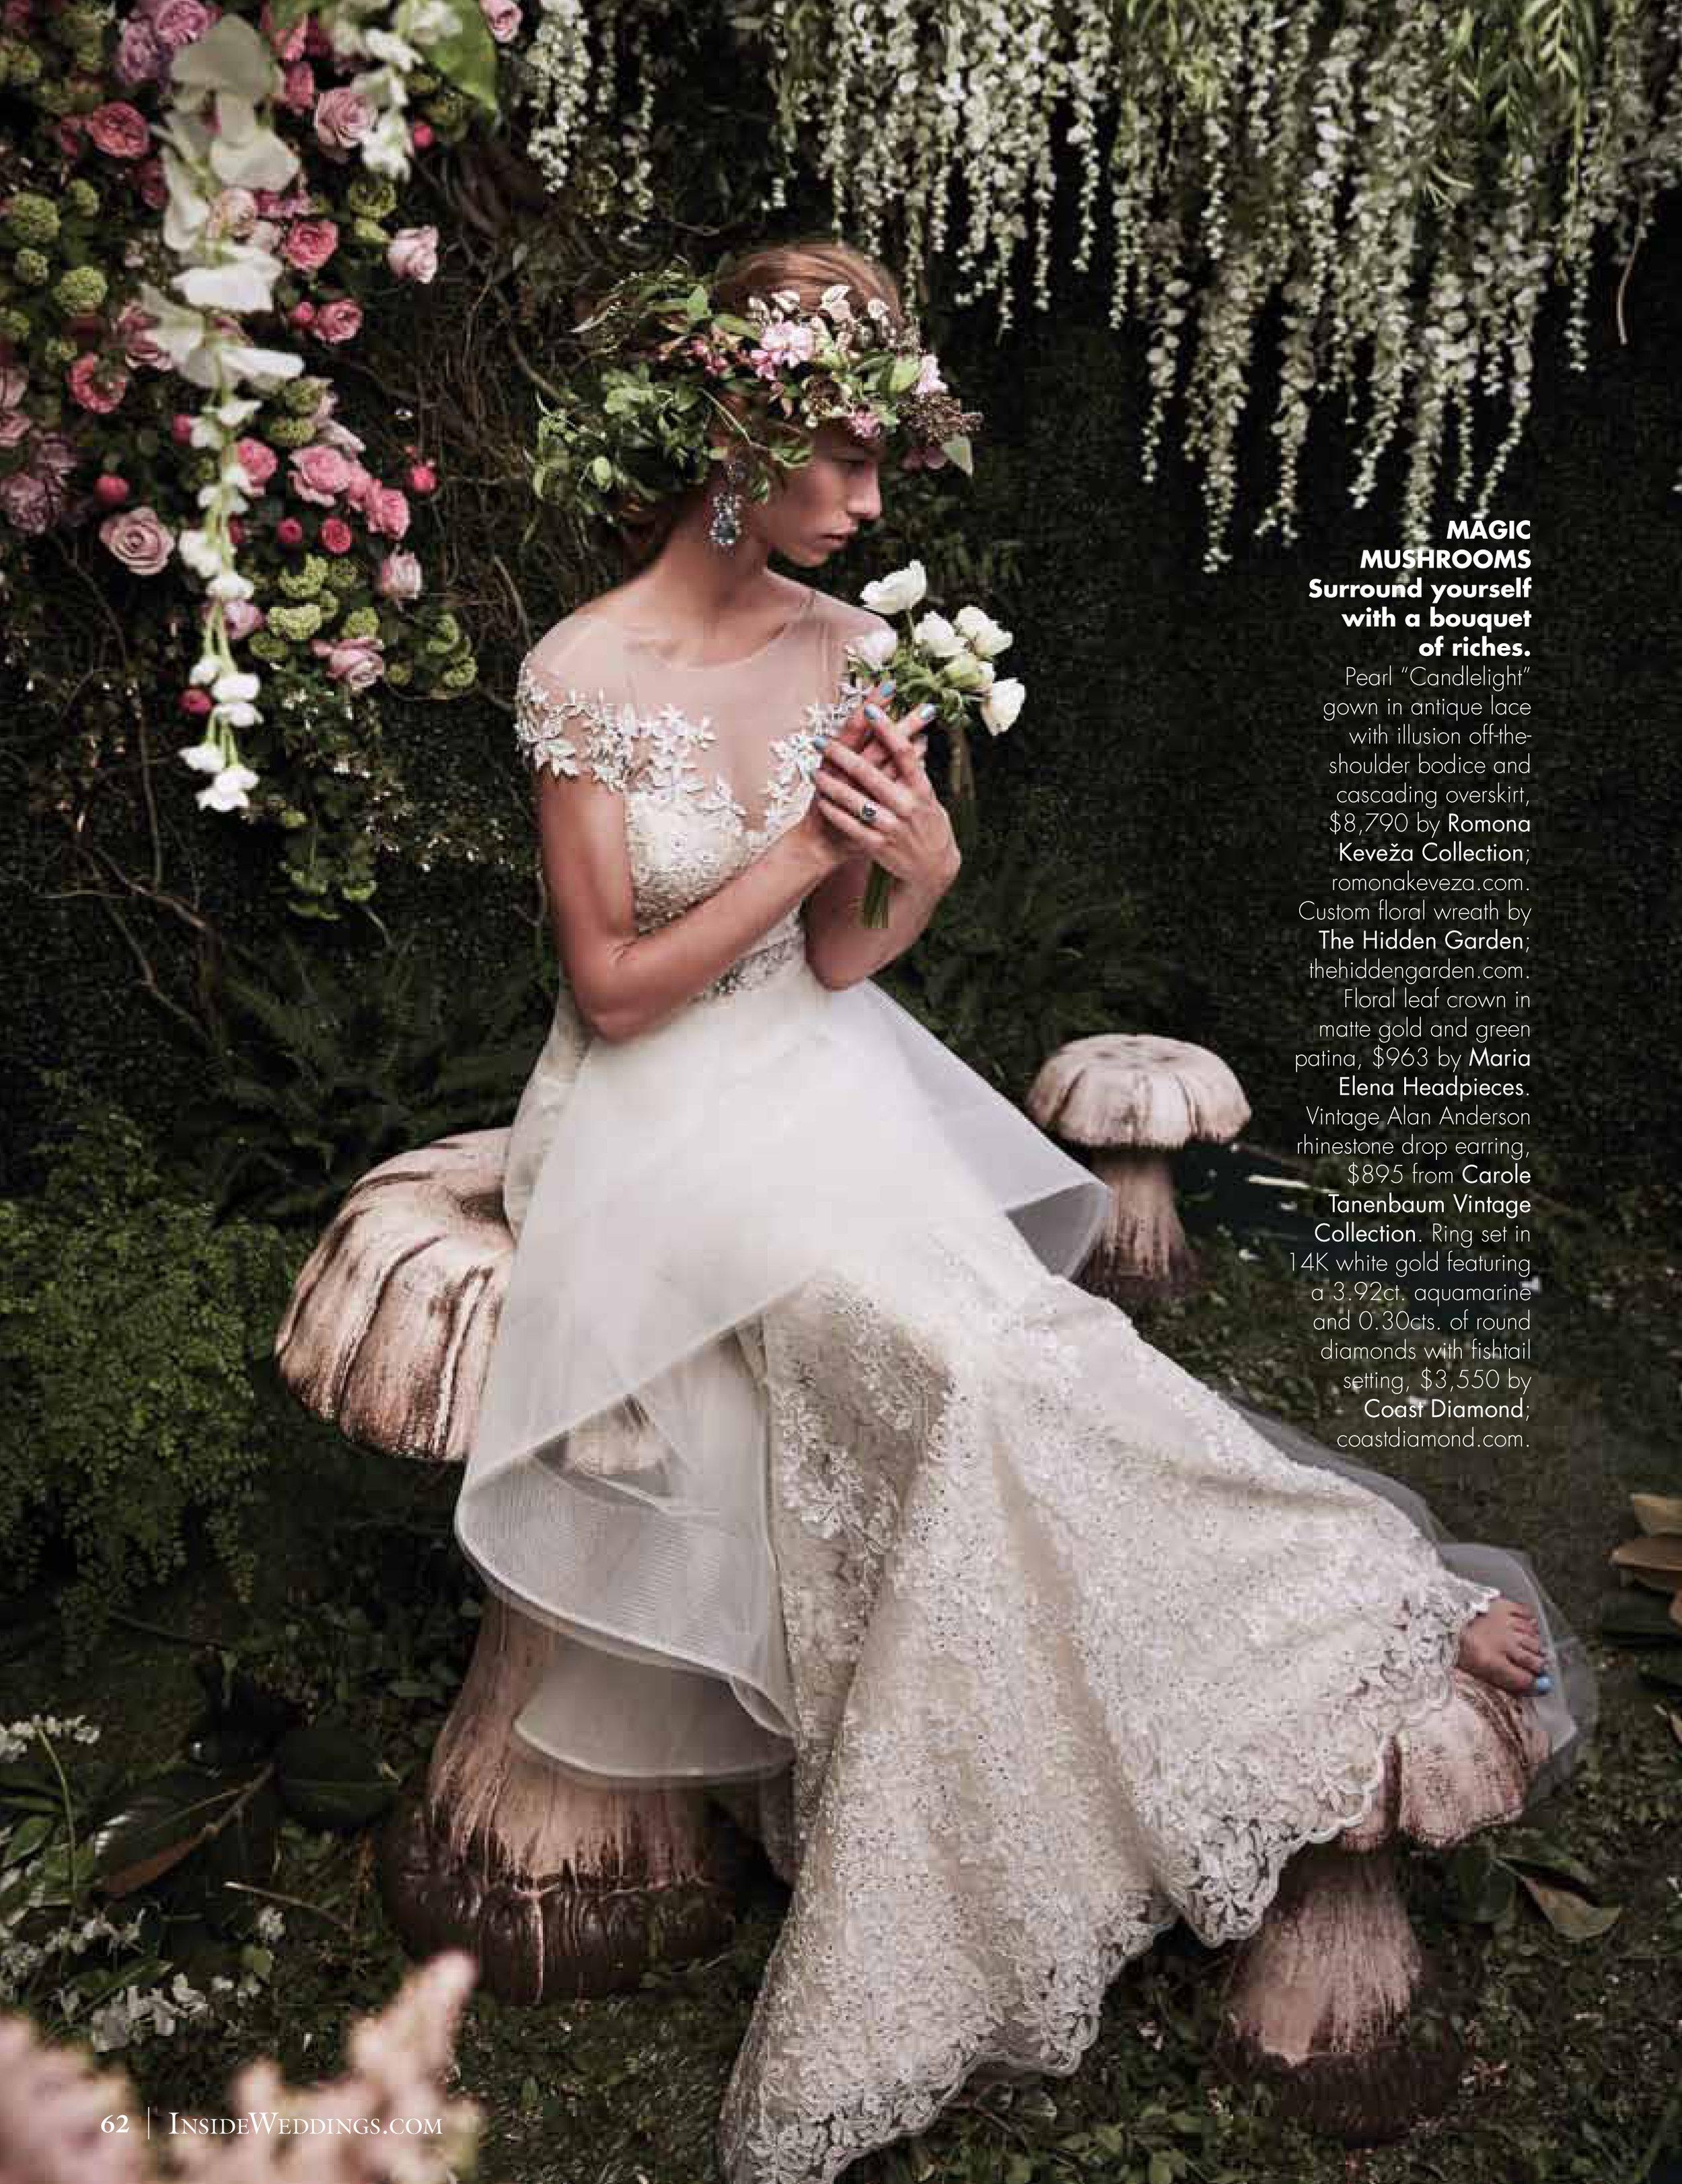 Garden Fashion p62.jpg